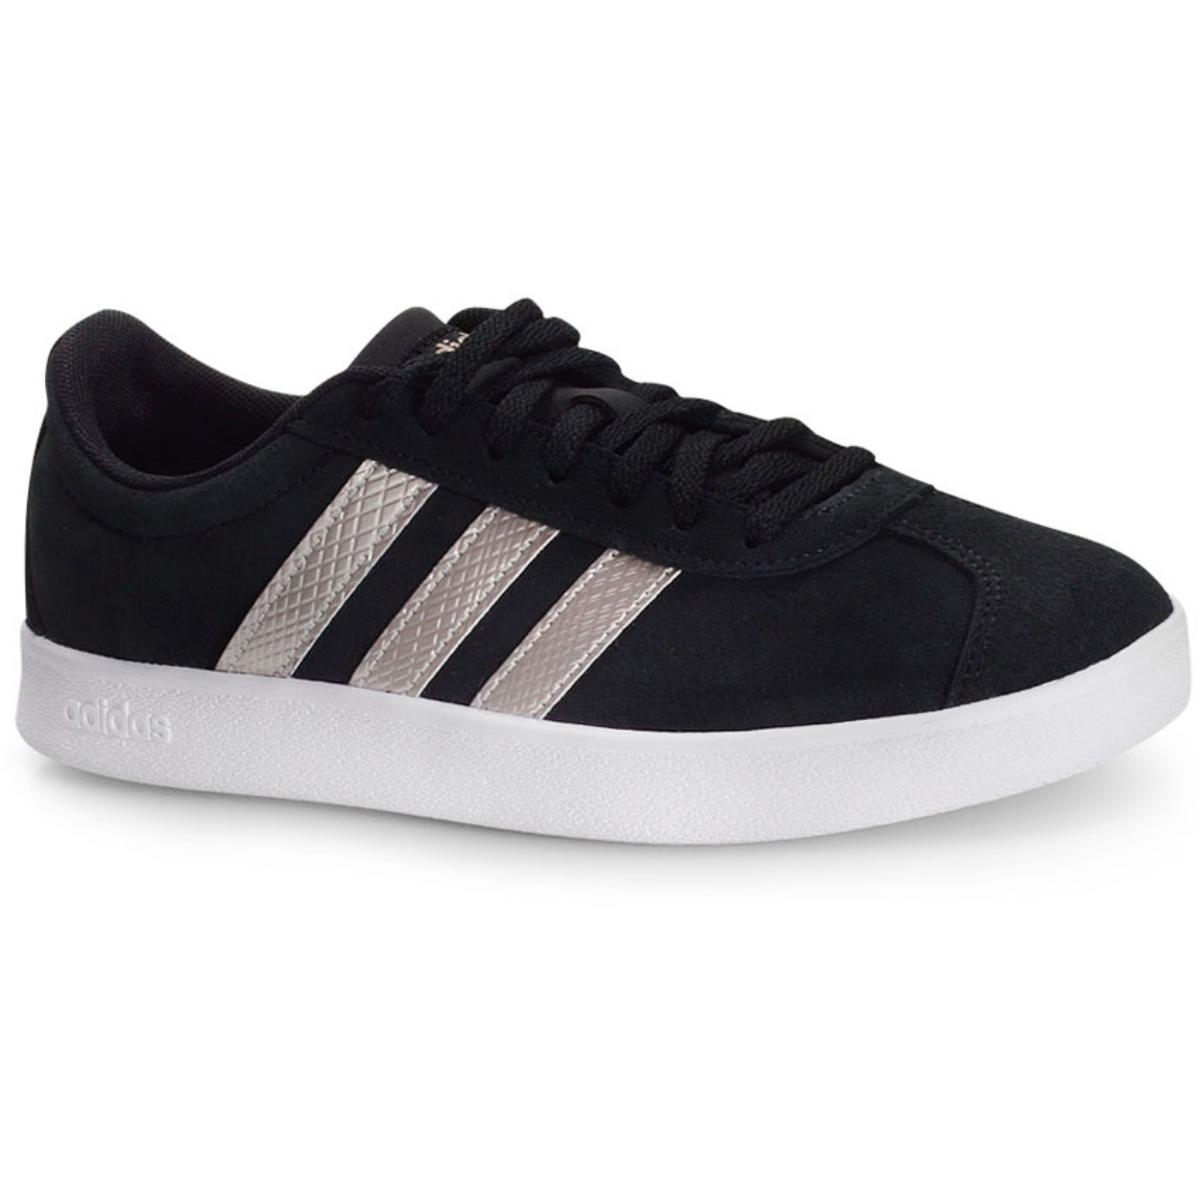 Tênis Feminino Adidas Ee6784 vl Court 2.0 w Preto/prata